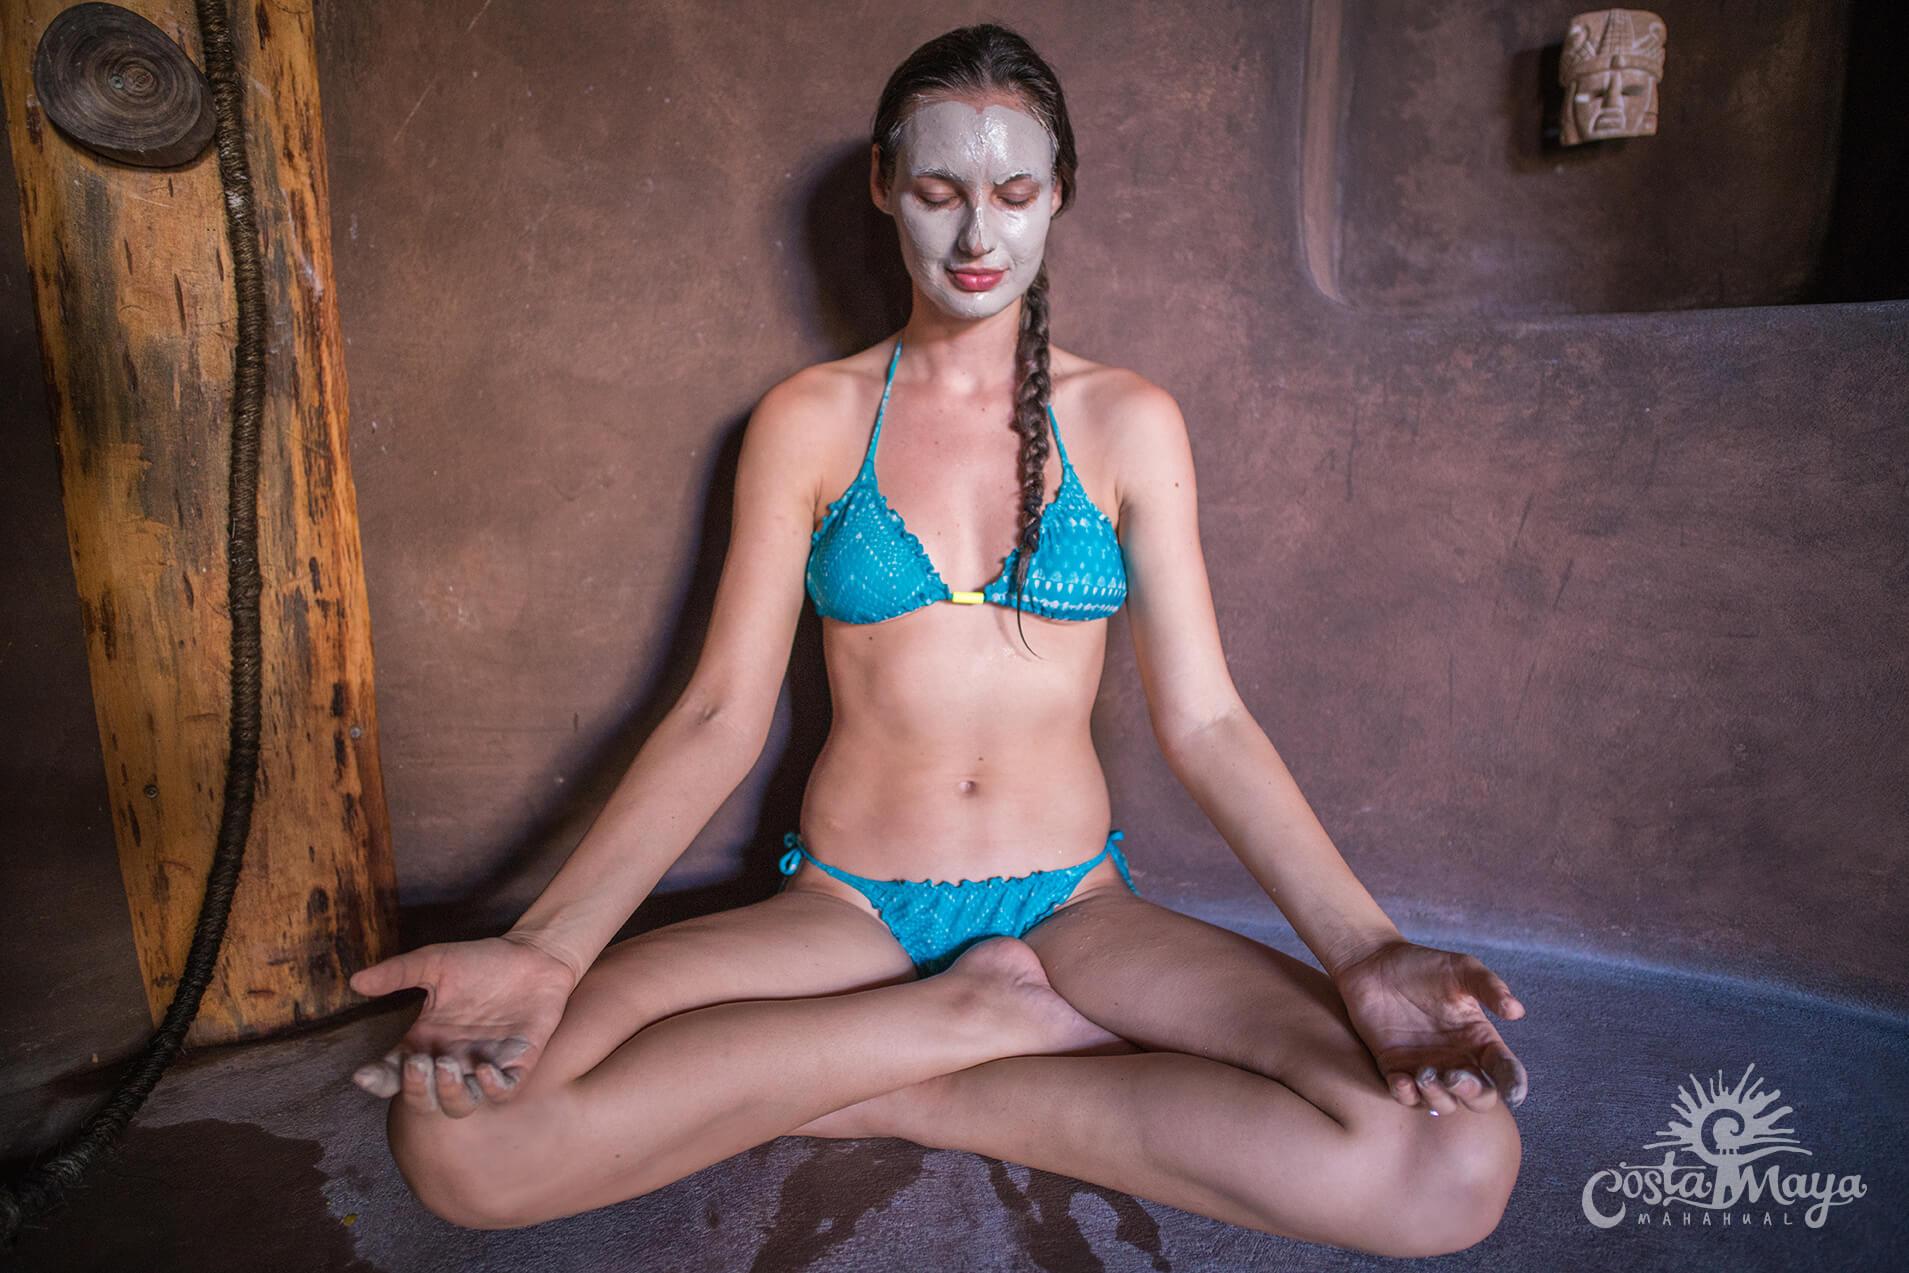 Costa Maya, Mayan Healing Rituals